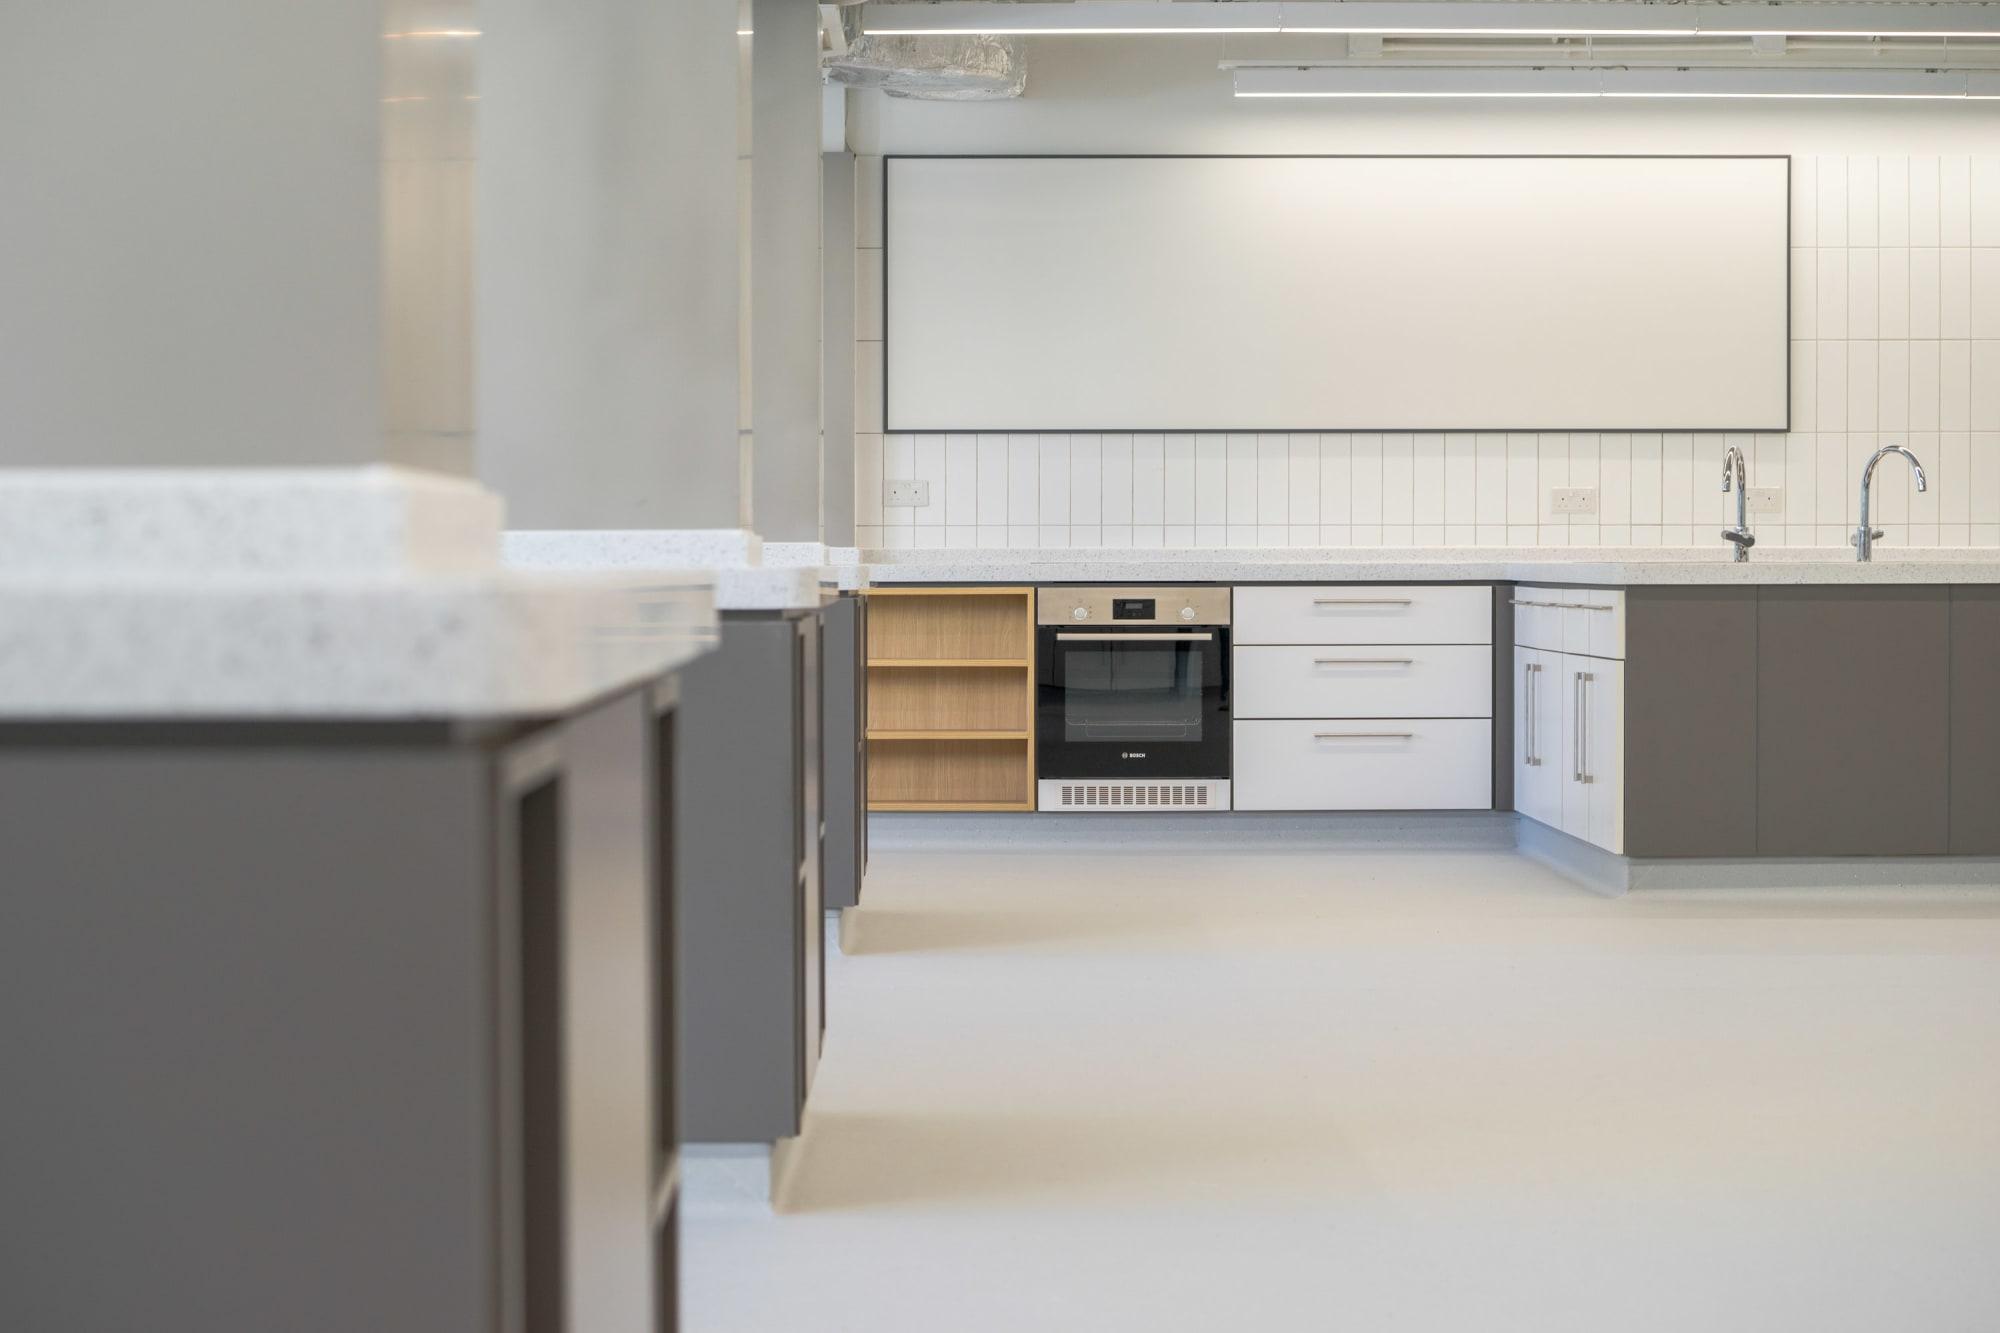 KGV Food Tech Room and Design & Tech Room